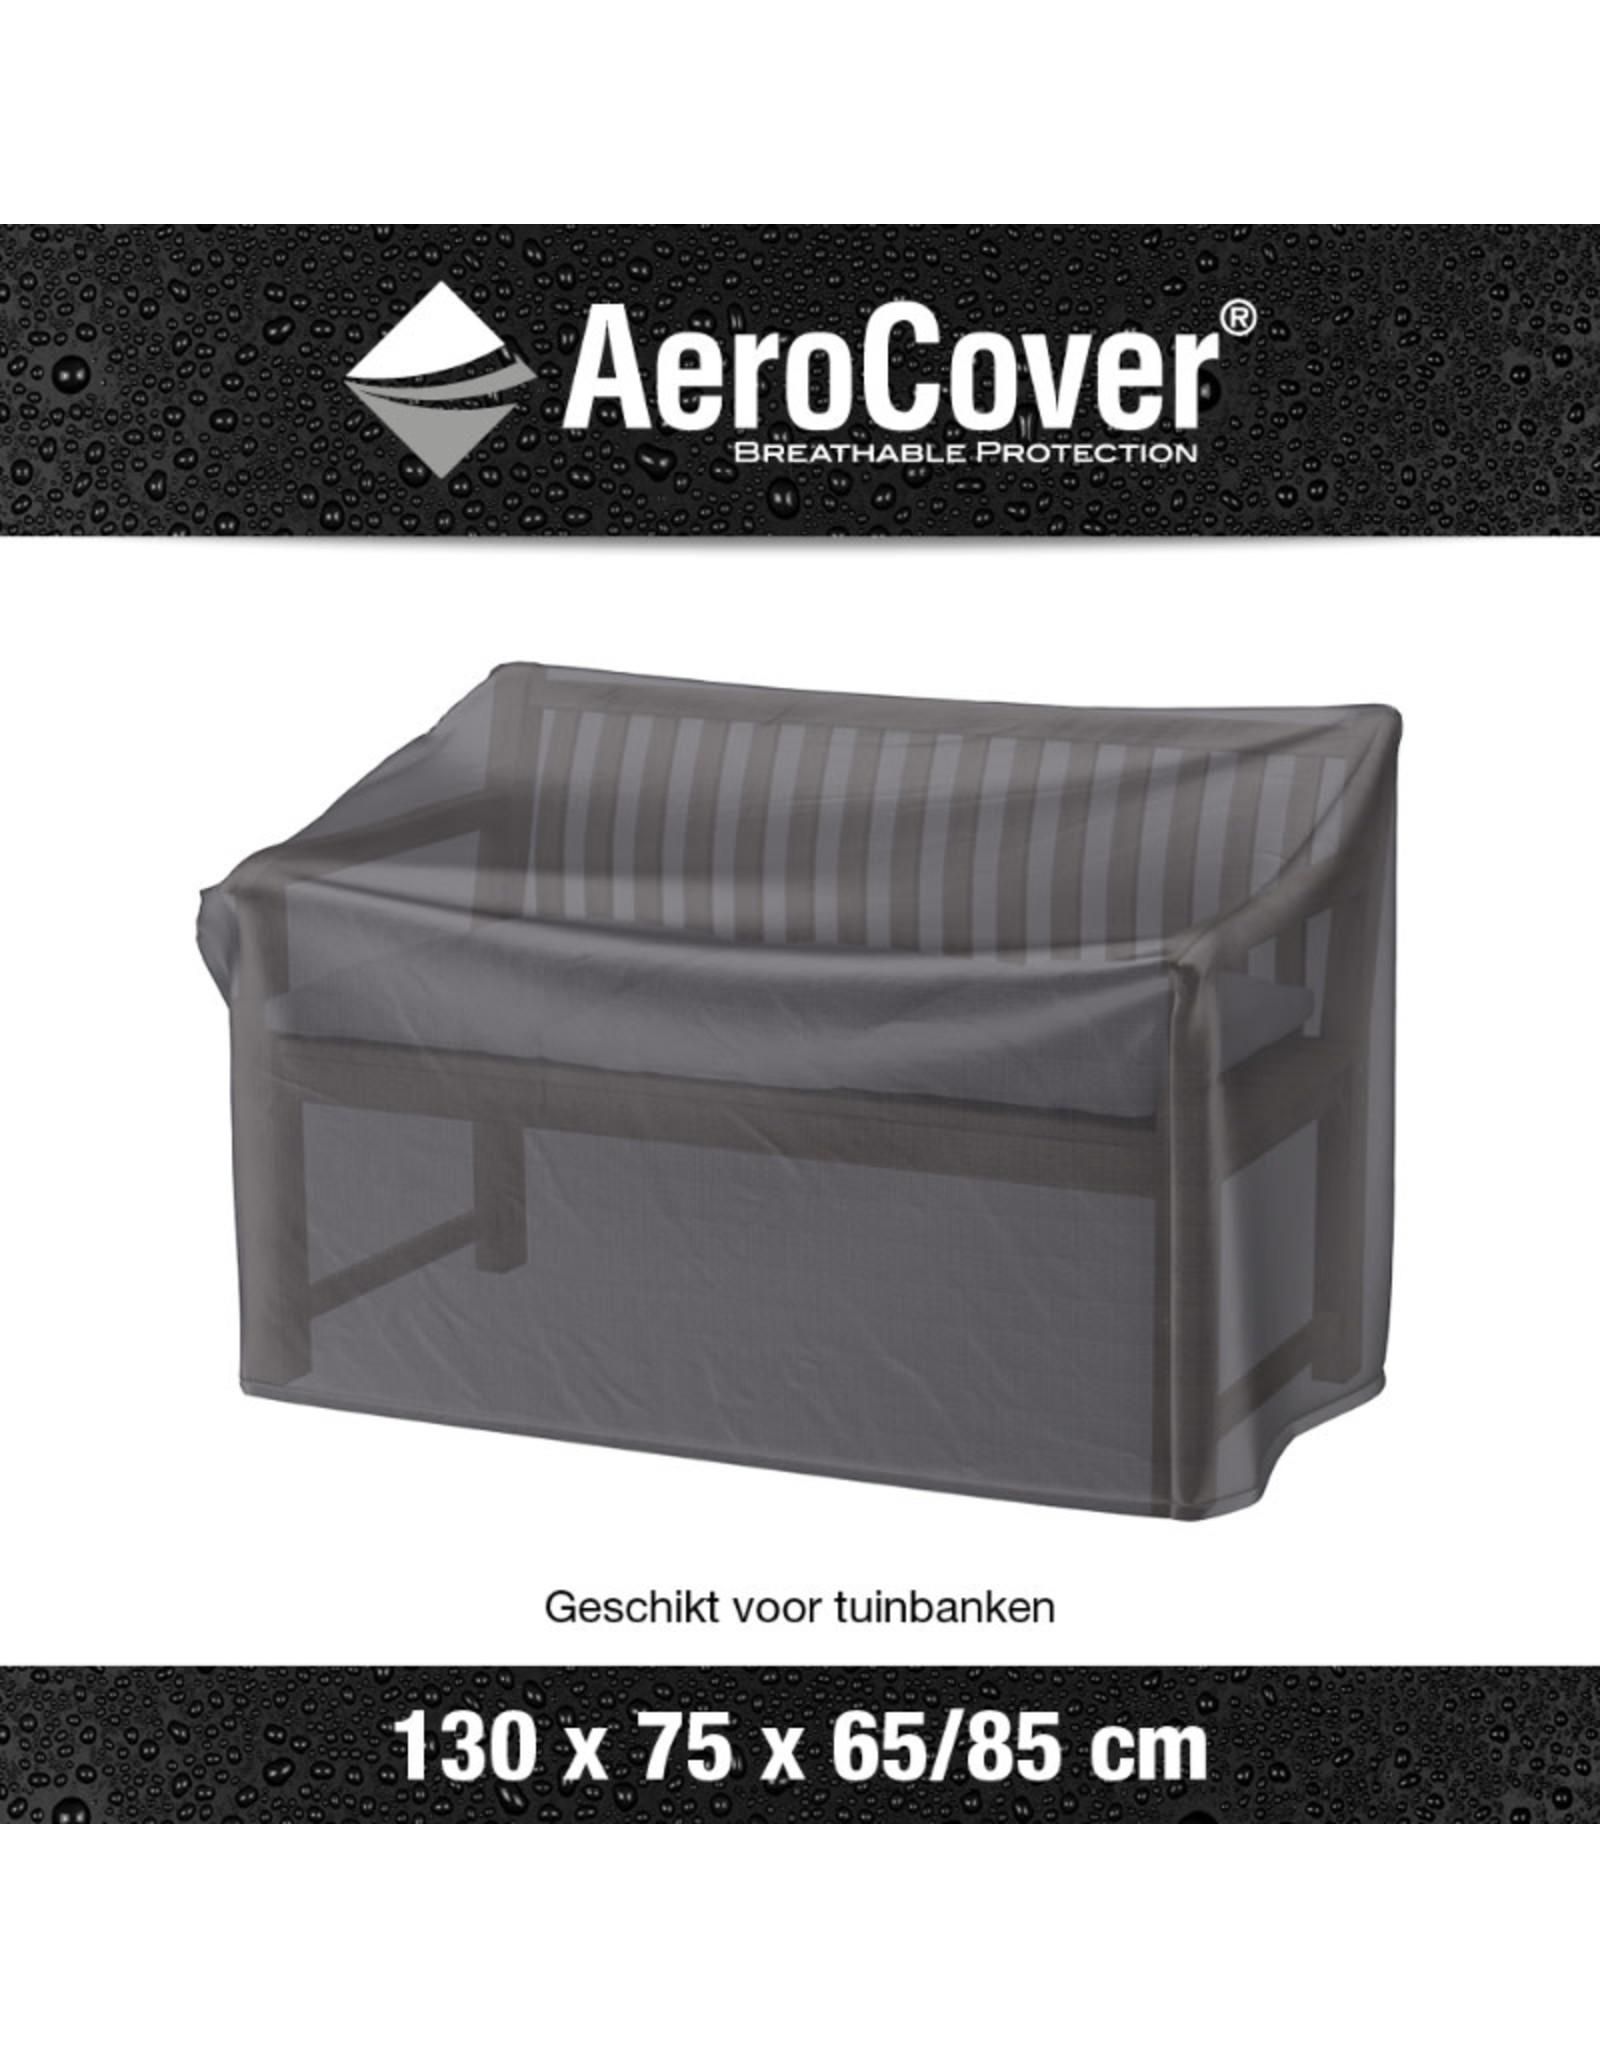 Aerocover AeroCover Tuinbankhoes 130x75x65-85 nr.7908